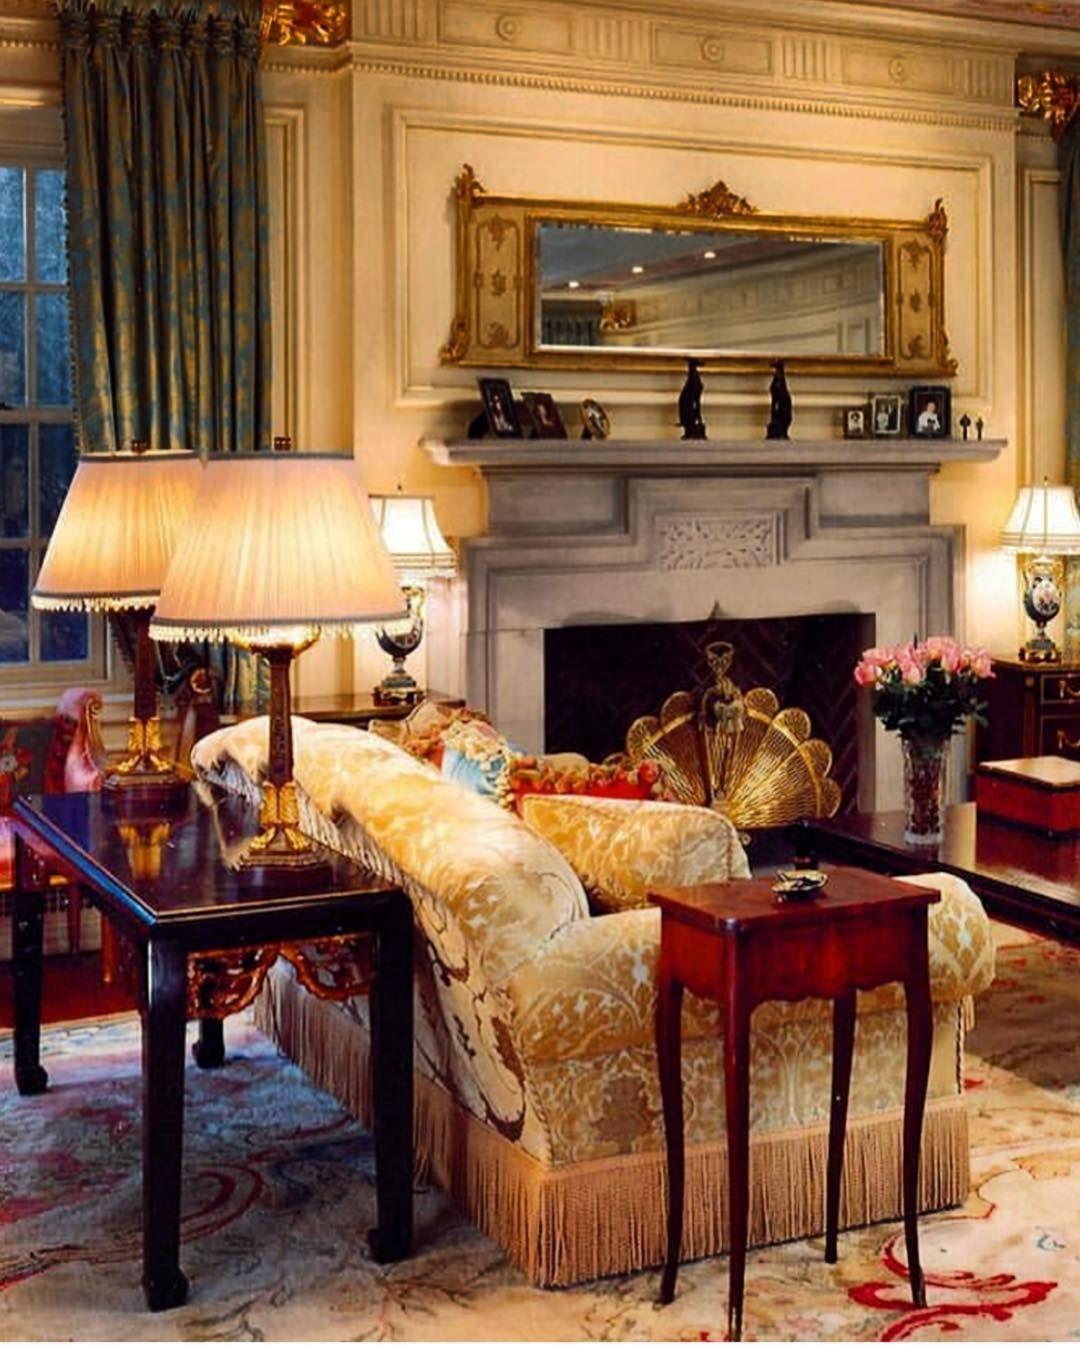 Timeless Design Via Nidiaperez52 Itsforever Antiquelovers French Antique Homedec Living Room Warm Living Room Decor Traditional Traditional Living Room